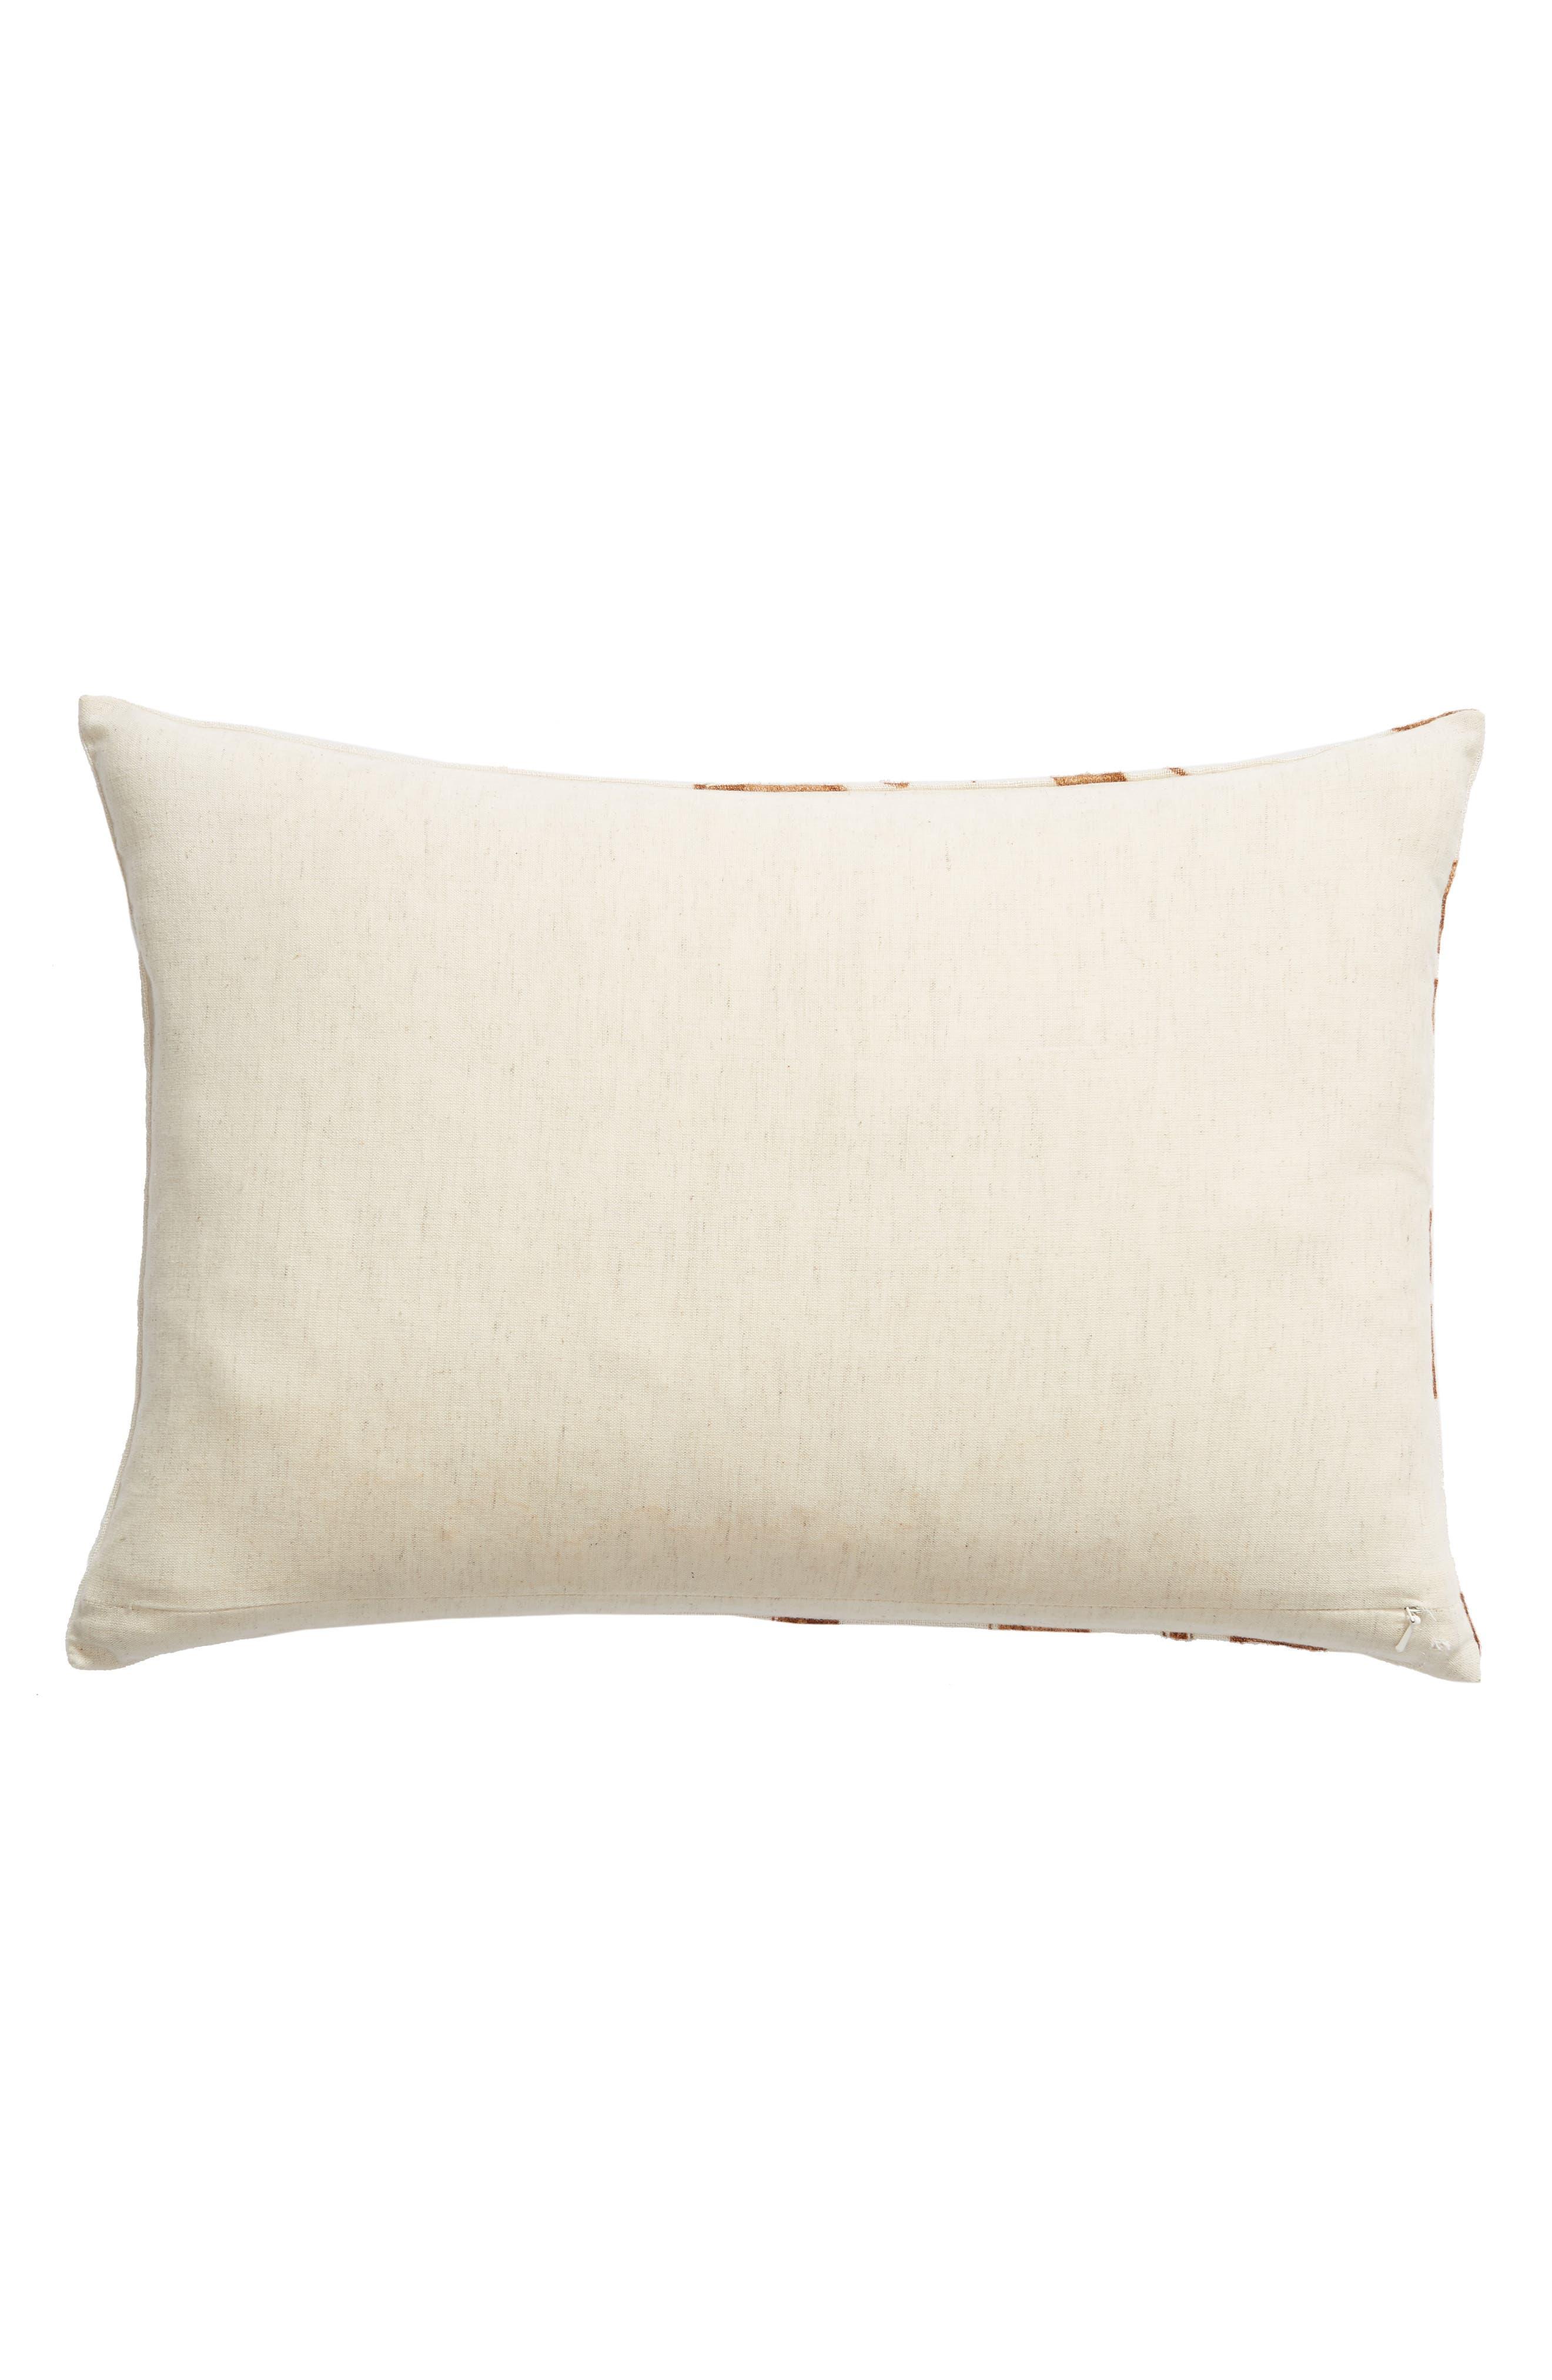 TREASURE & BOND, Vine Accent Pillow, Alternate thumbnail 2, color, BROWN RUSTIC MULTI